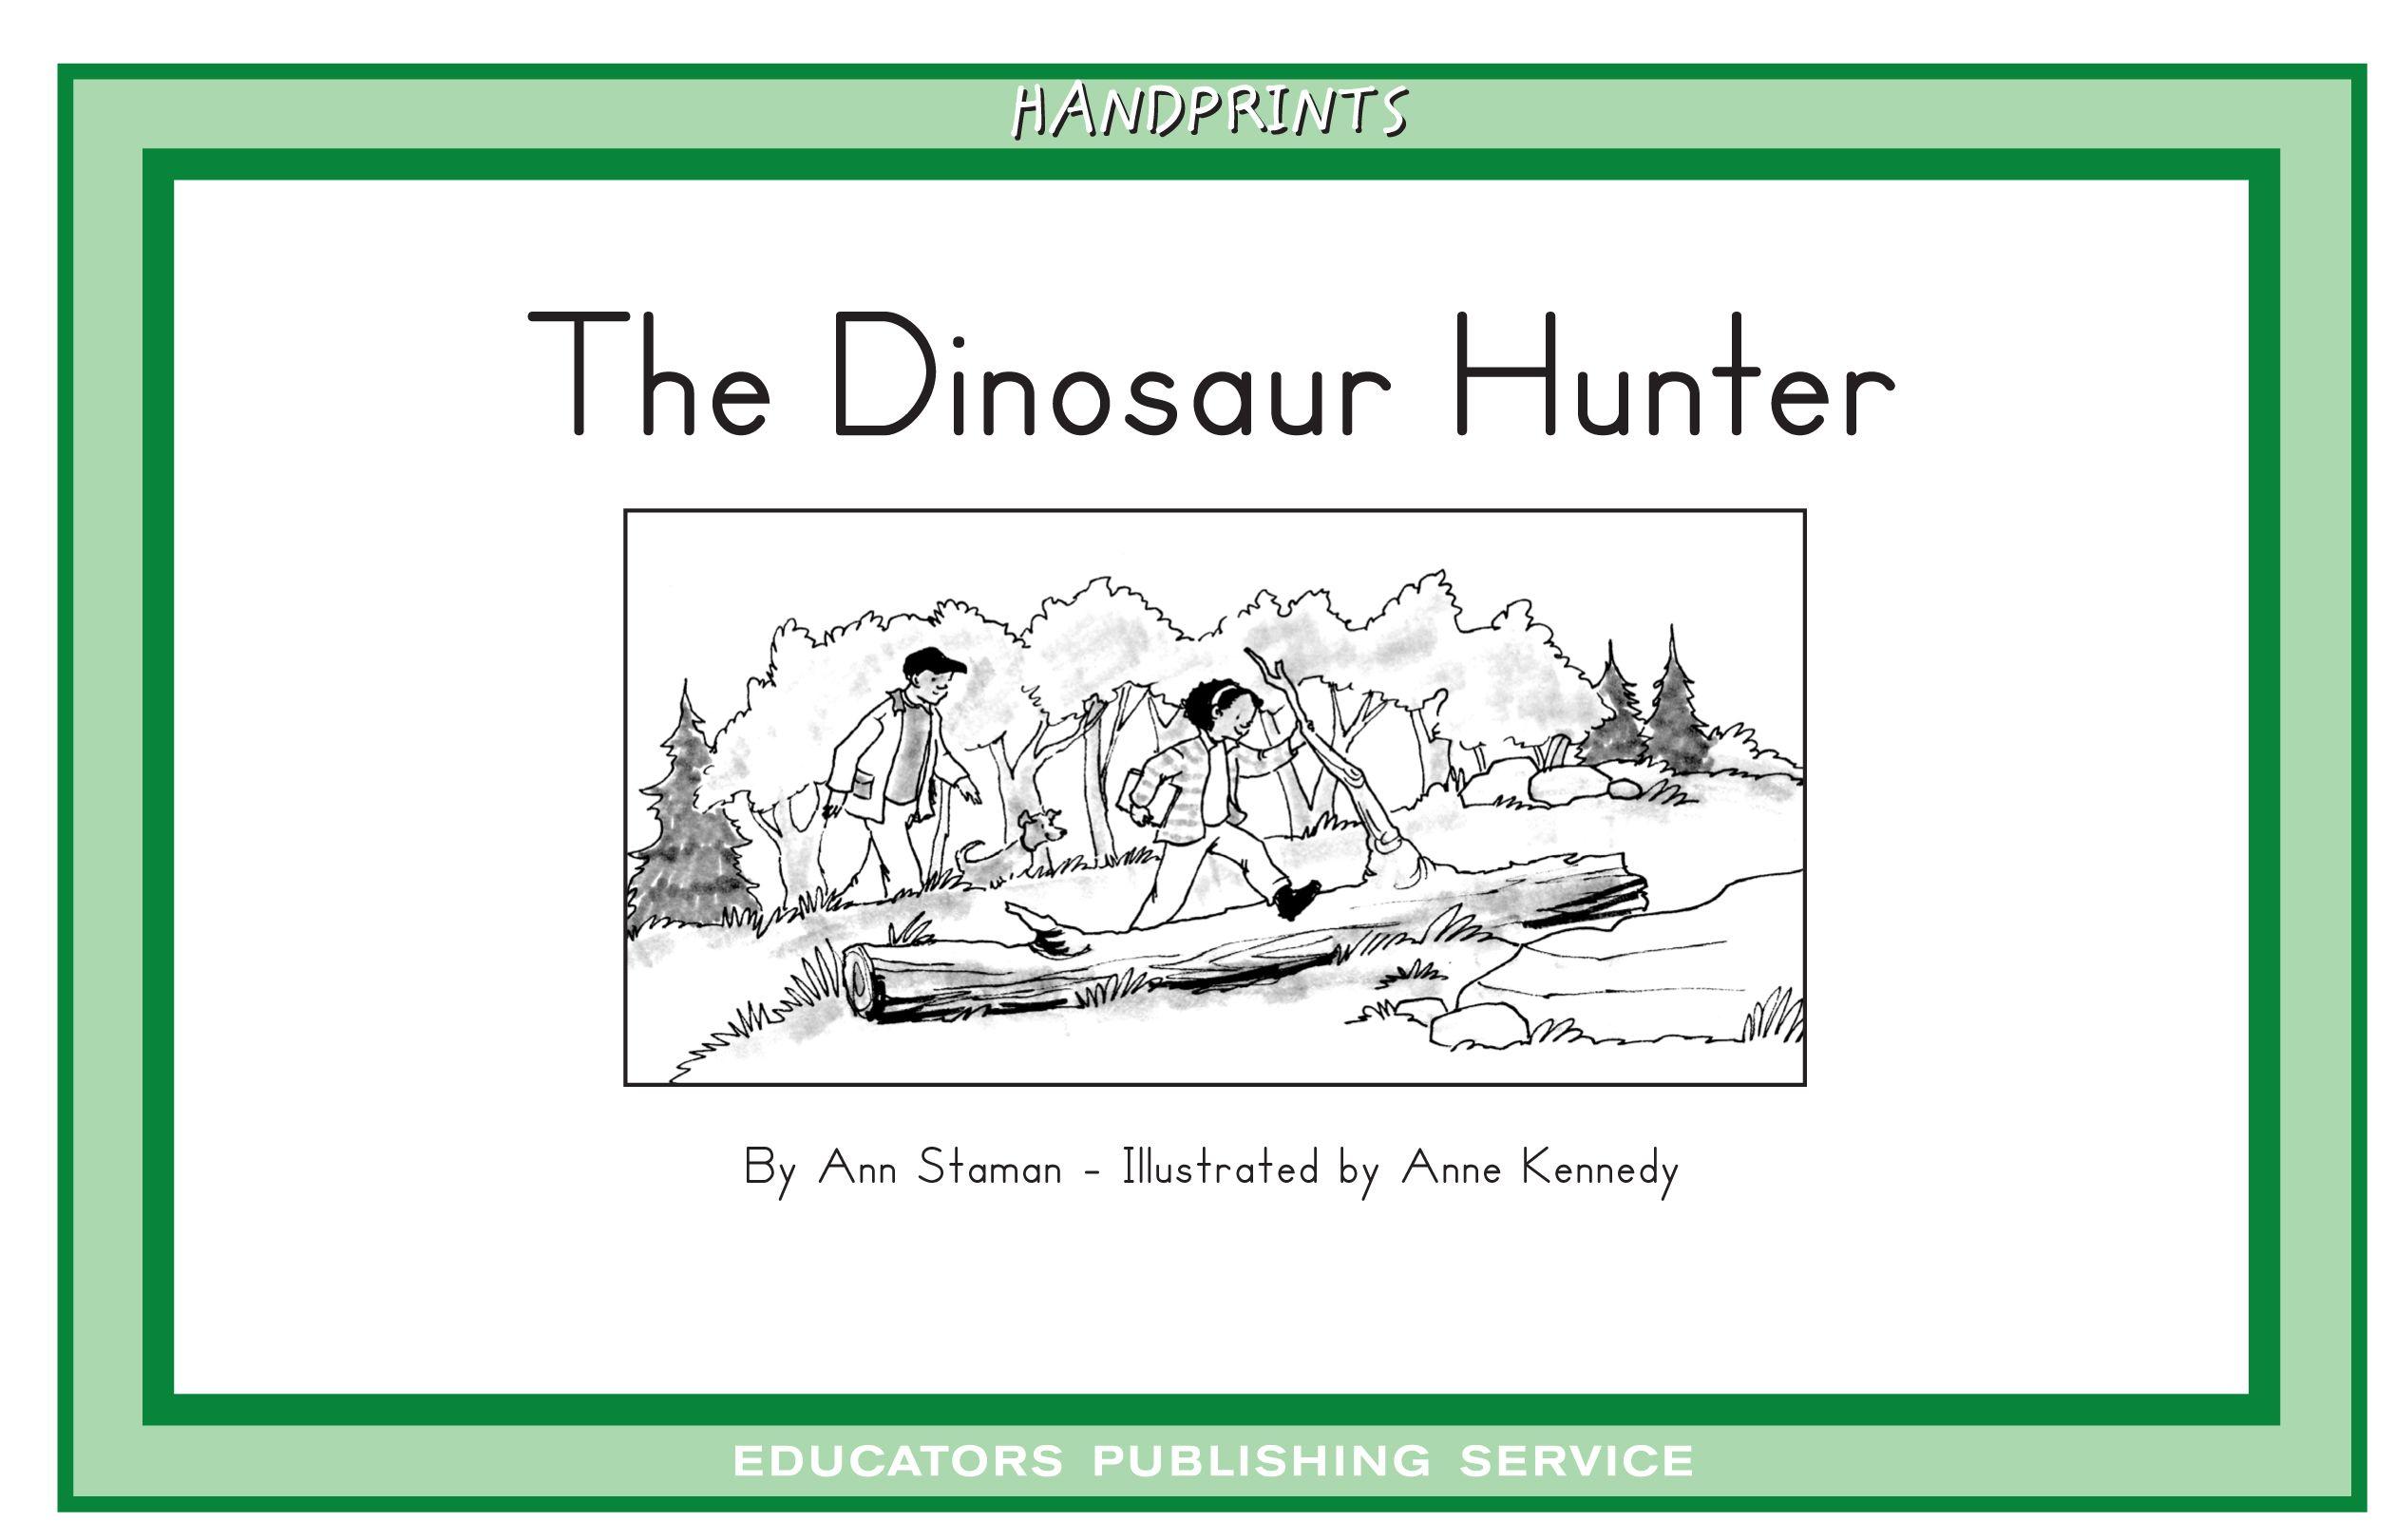 The Dinosaur Hunter Level 17 Handprints D Set 3